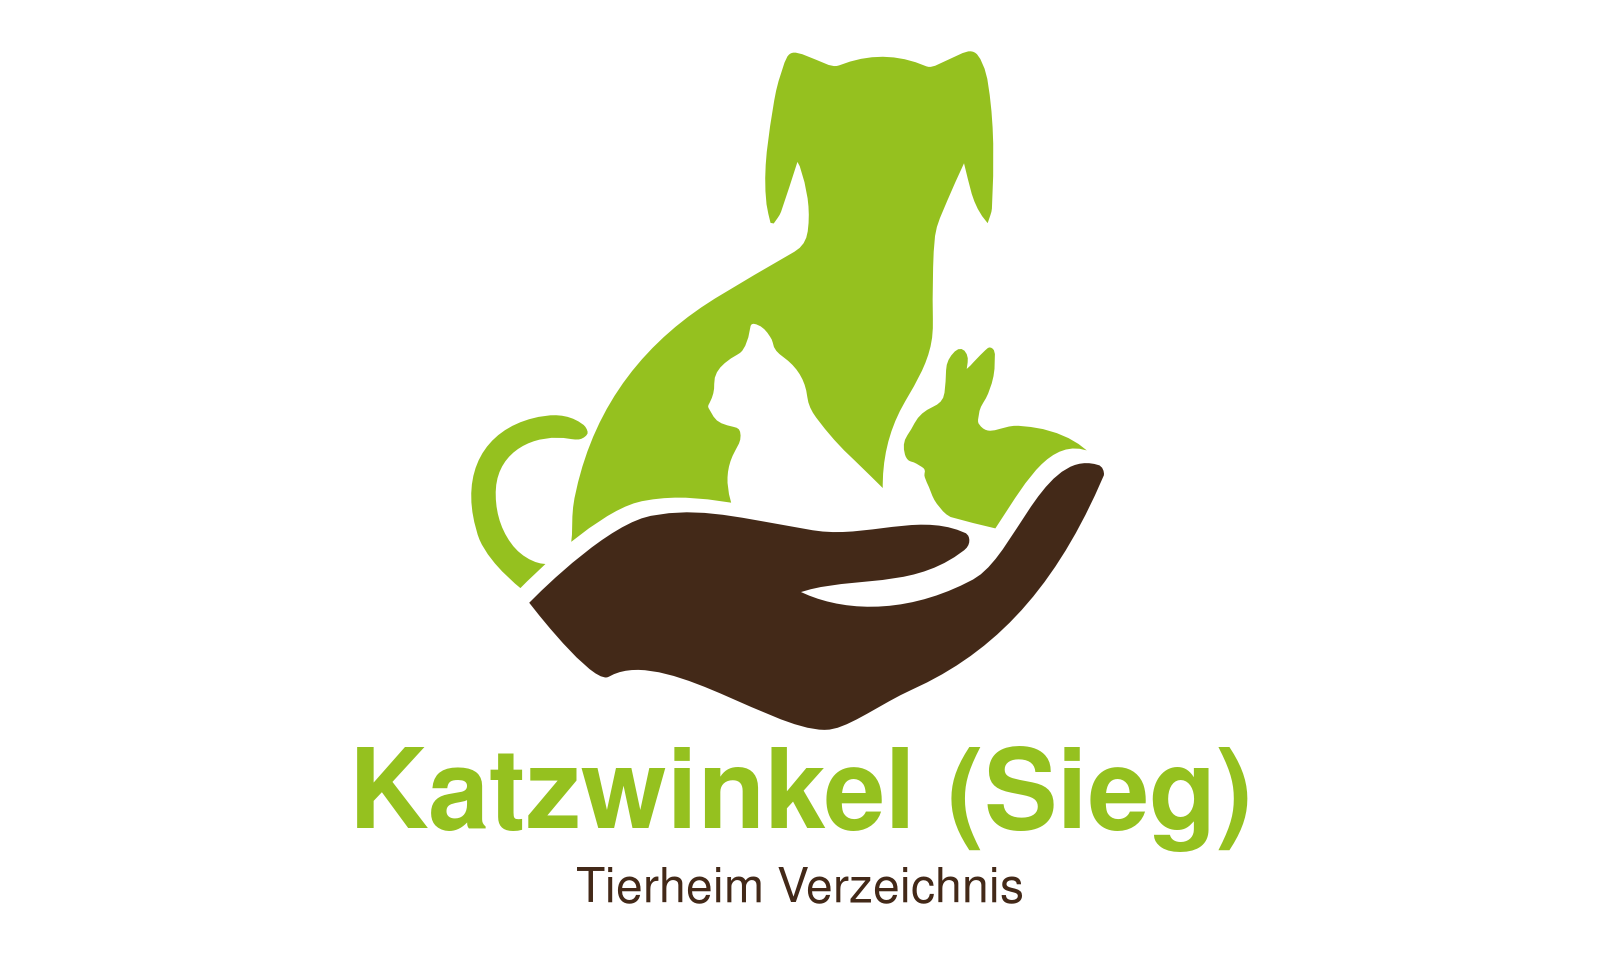 Tierheim Katzwinkel (Sieg)